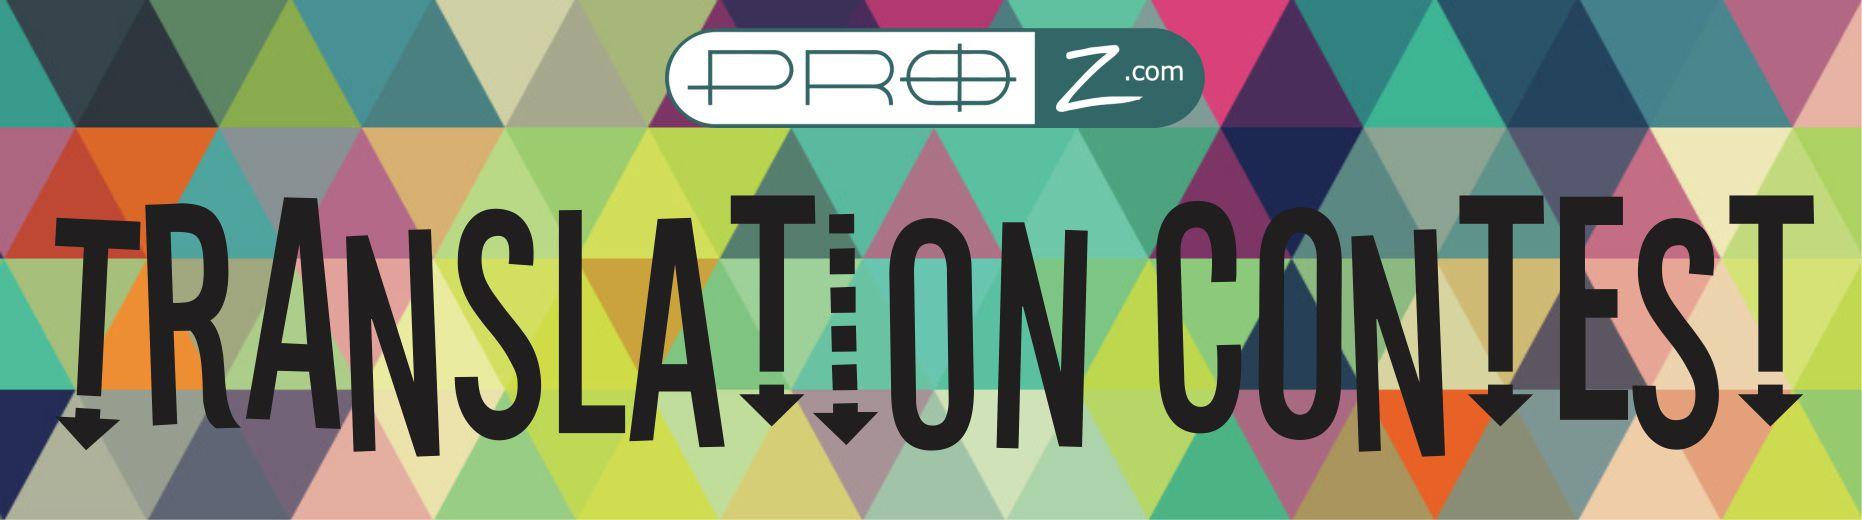 ProZ.com, the translation workplace